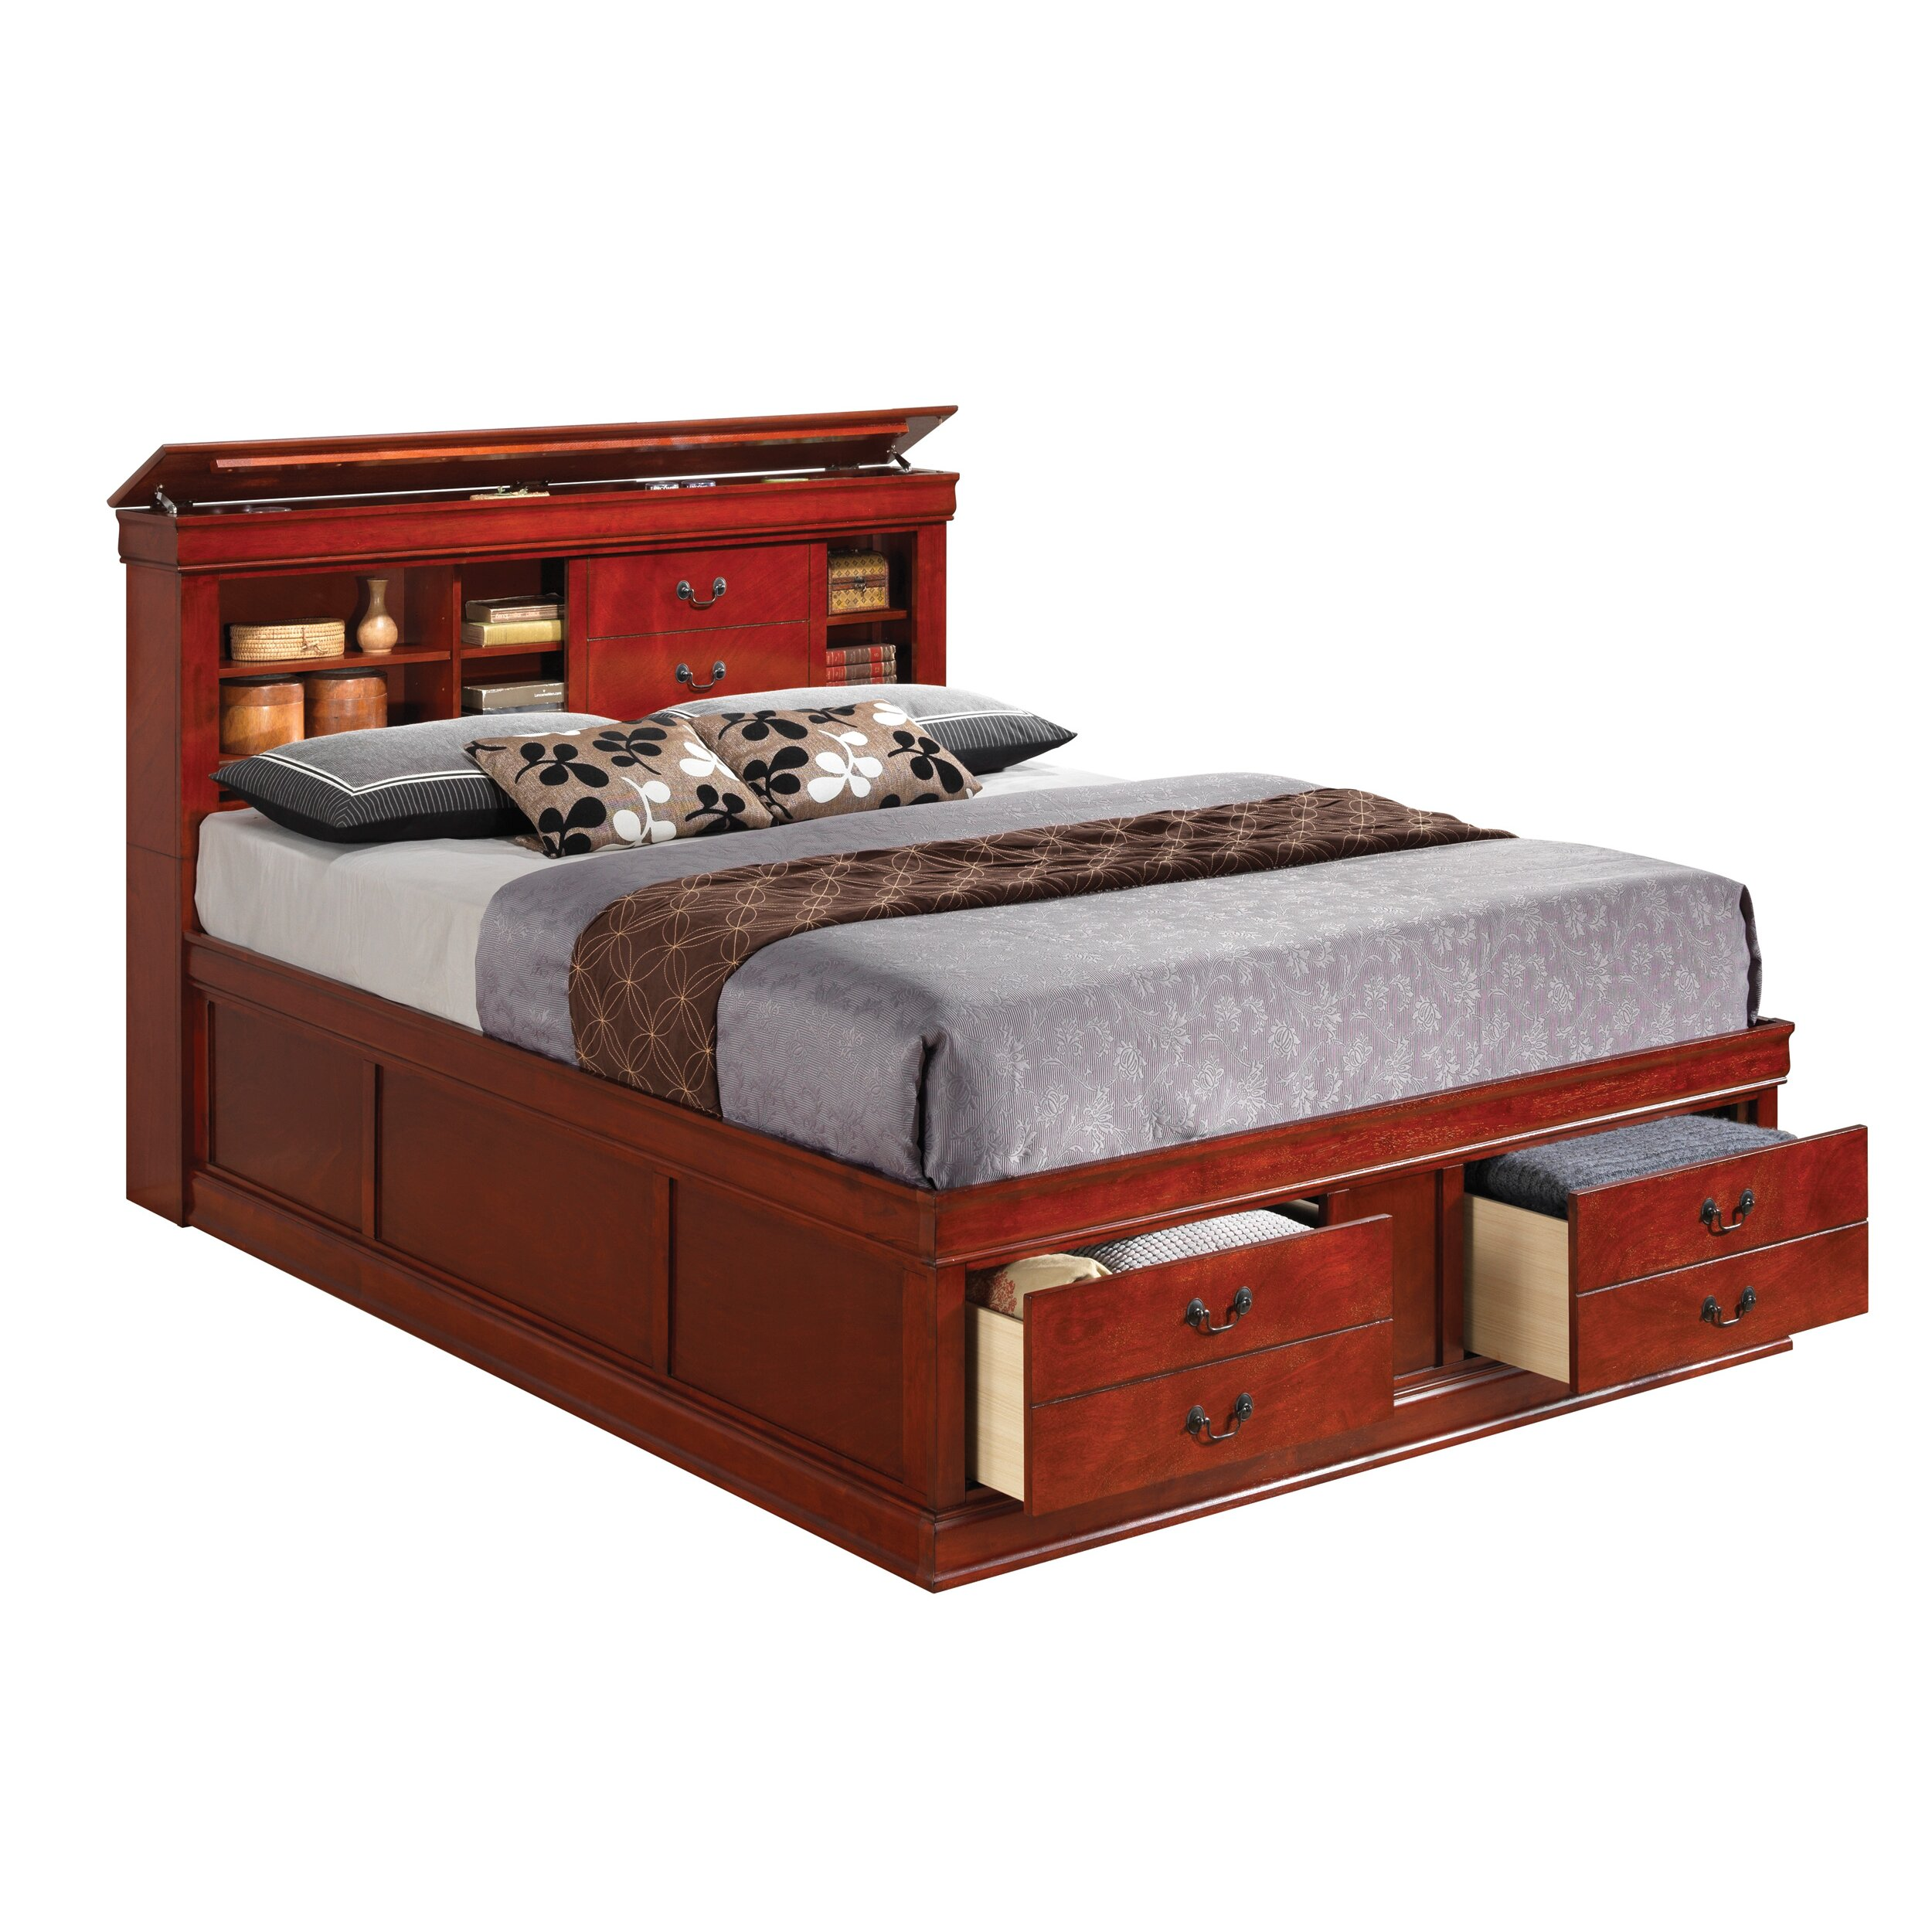 Wildon Home ® Louis Storage Platform Bed & Reviews | Wayfair